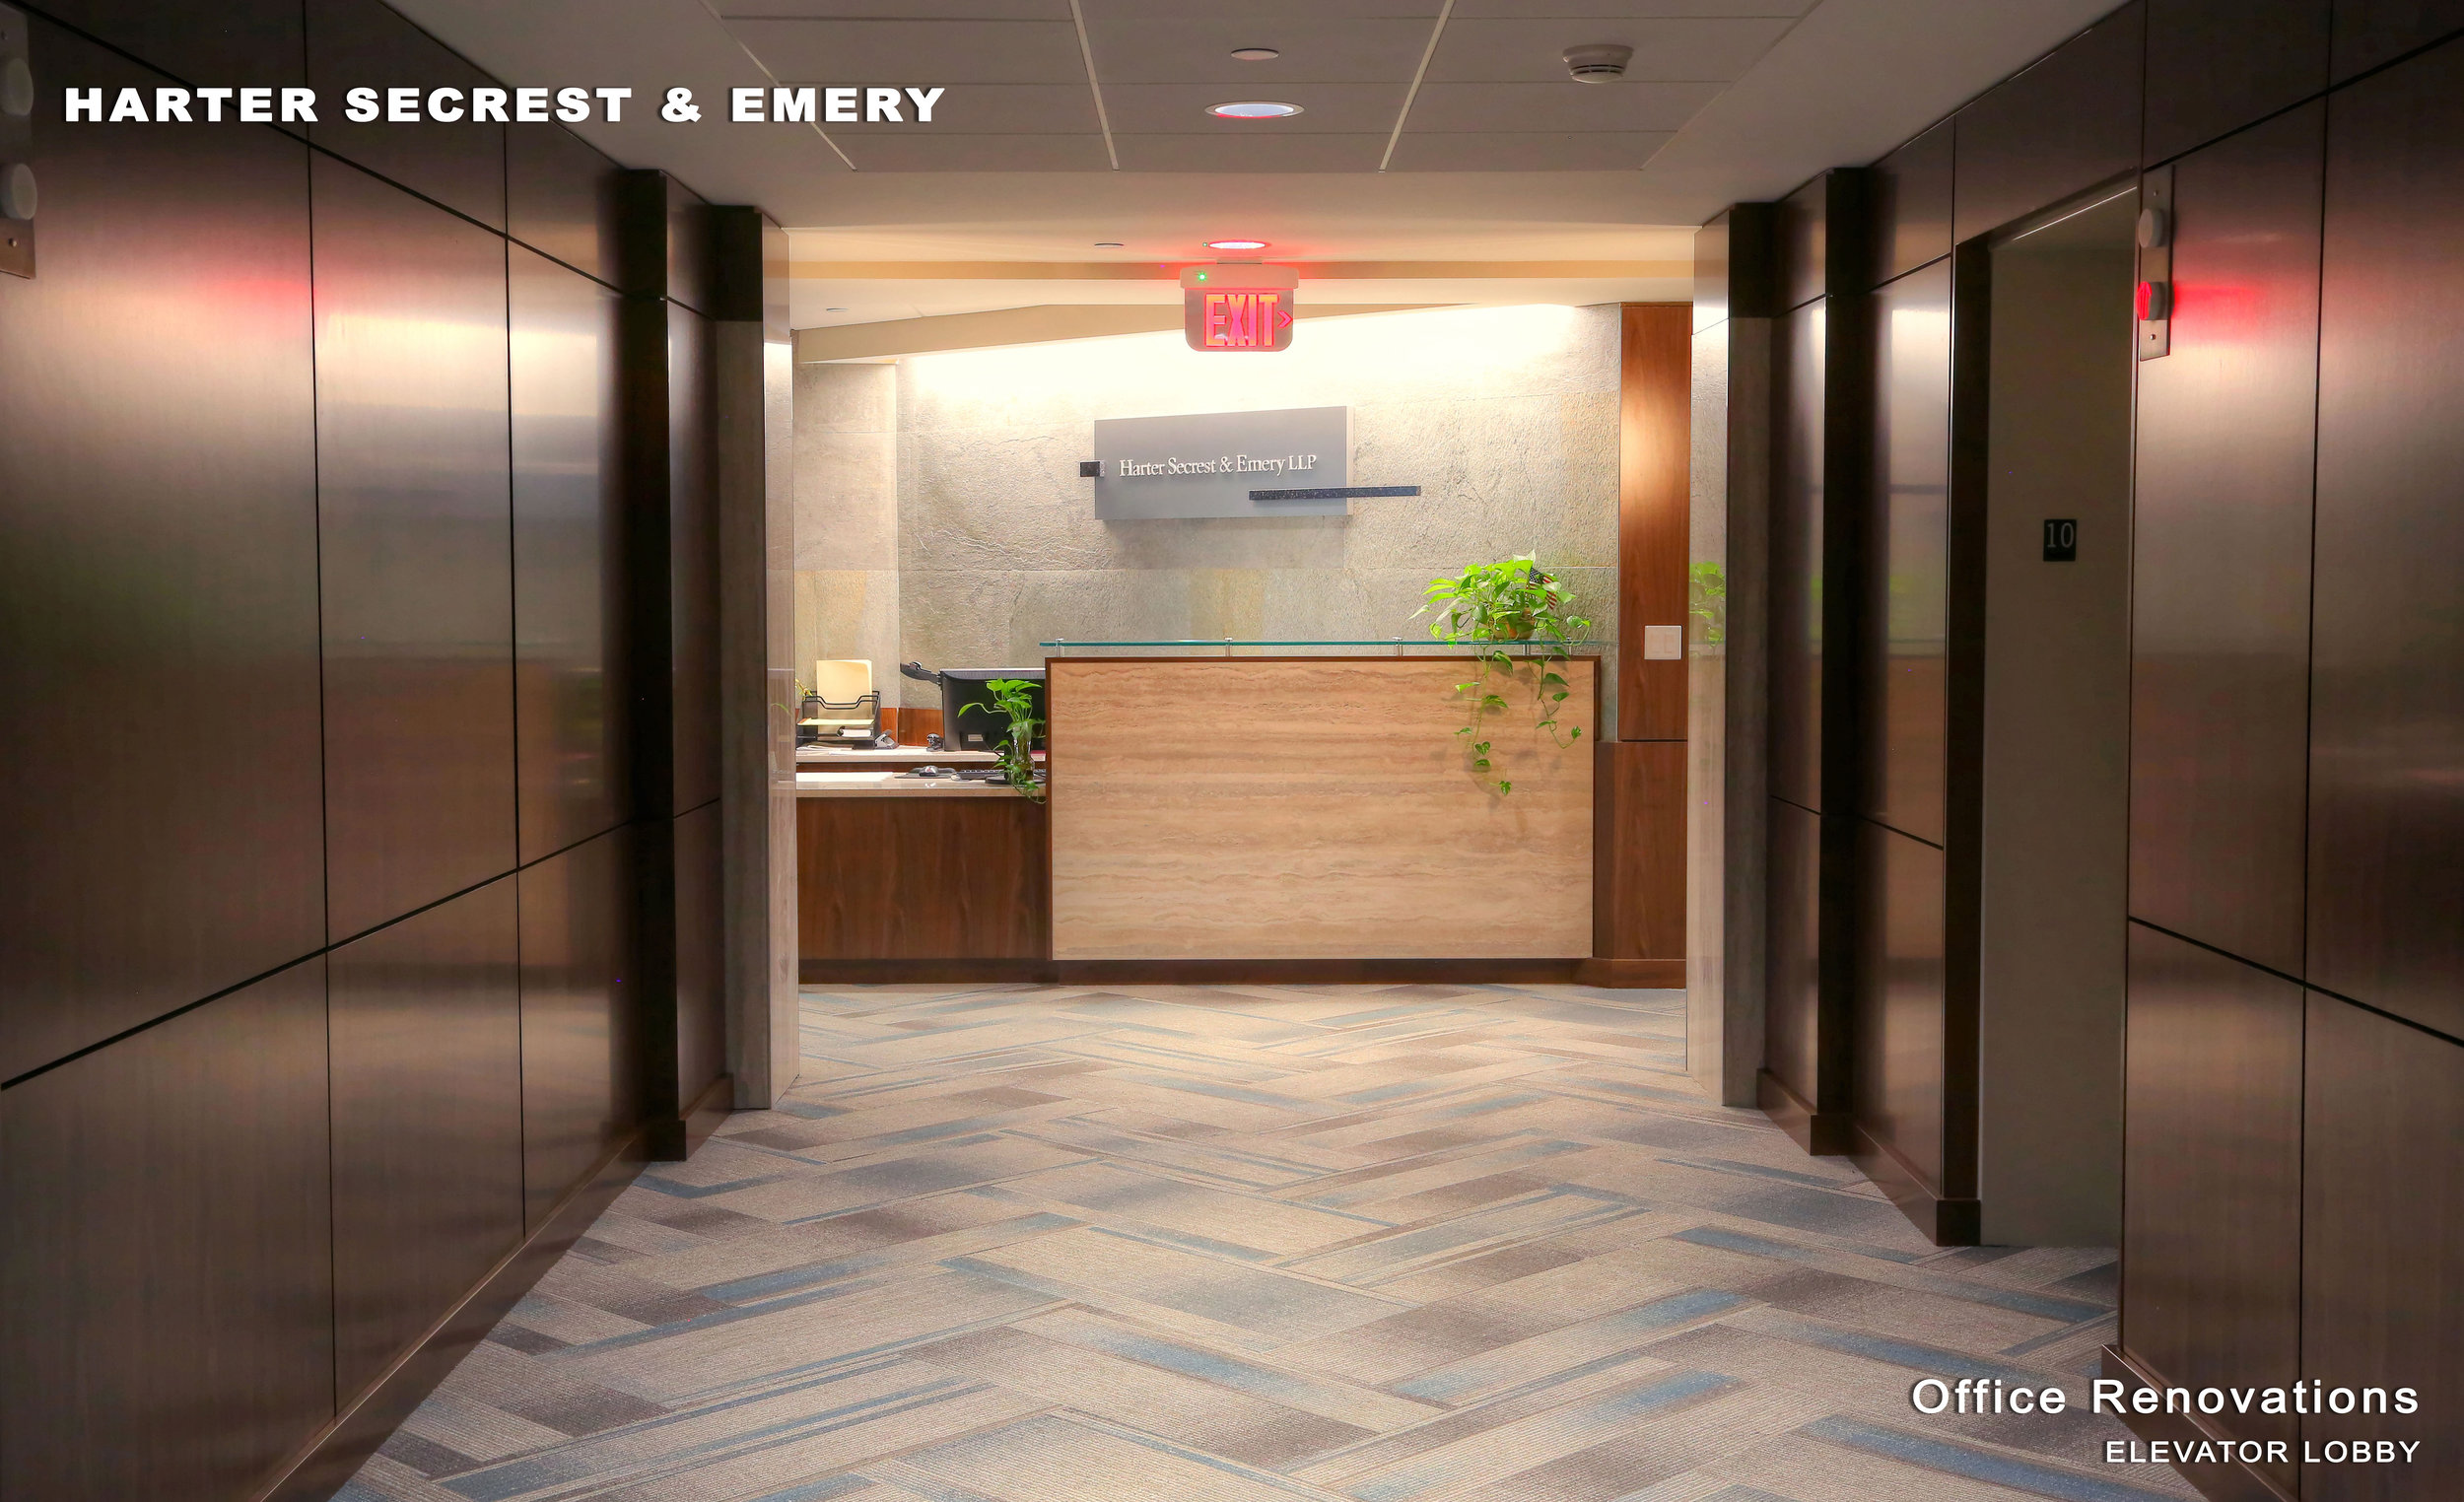 Harter Secrest & Emery Office Renovations